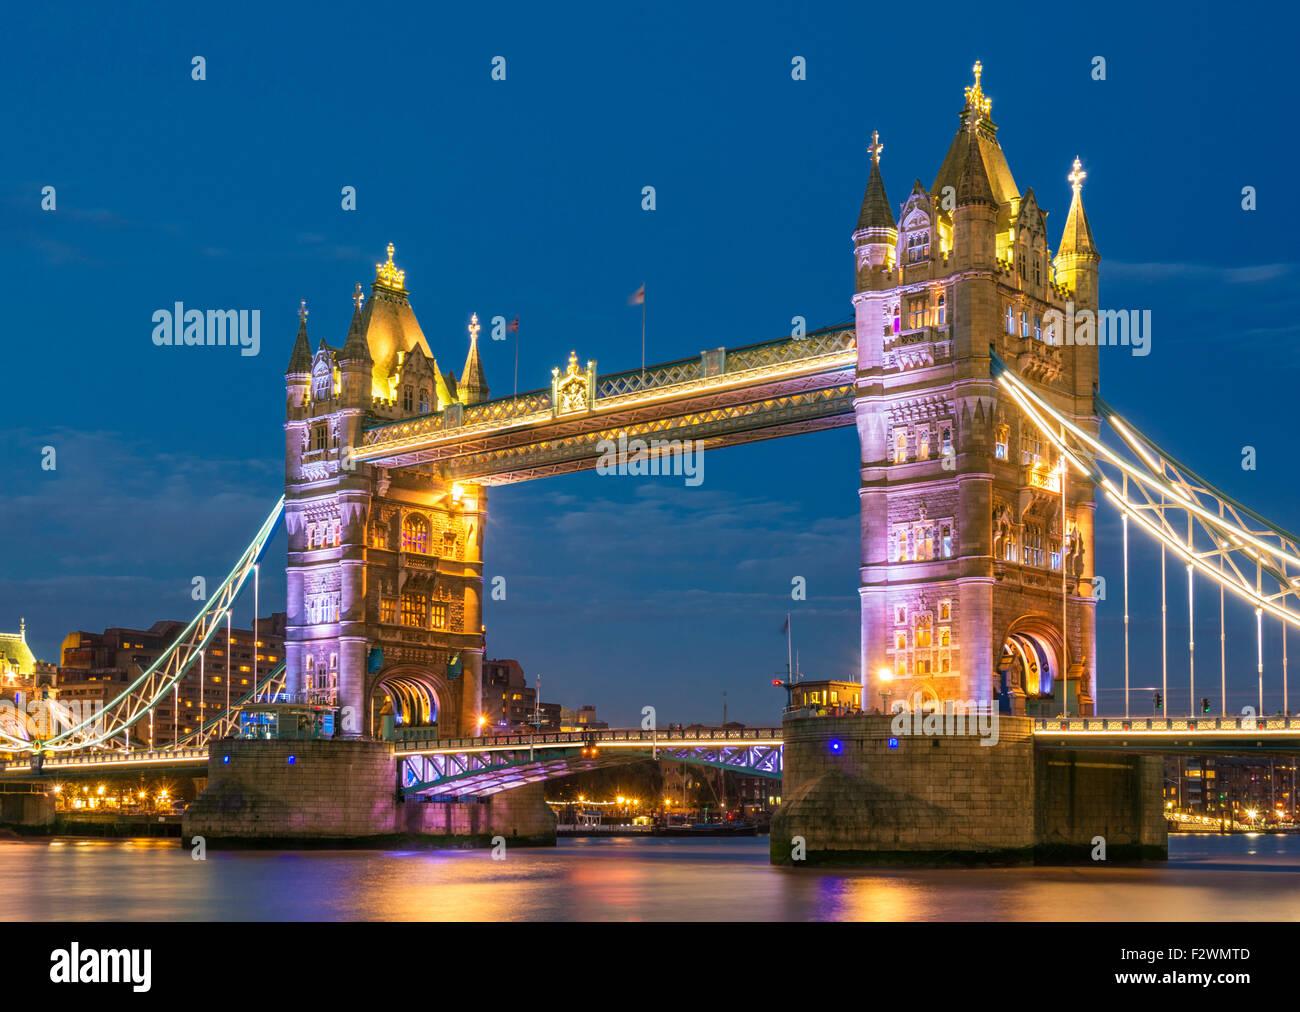 Beleuchtete Tower Bridge beleuchtet bei Nacht und River Thames Stadt London England GB UK EU Europas Stockbild